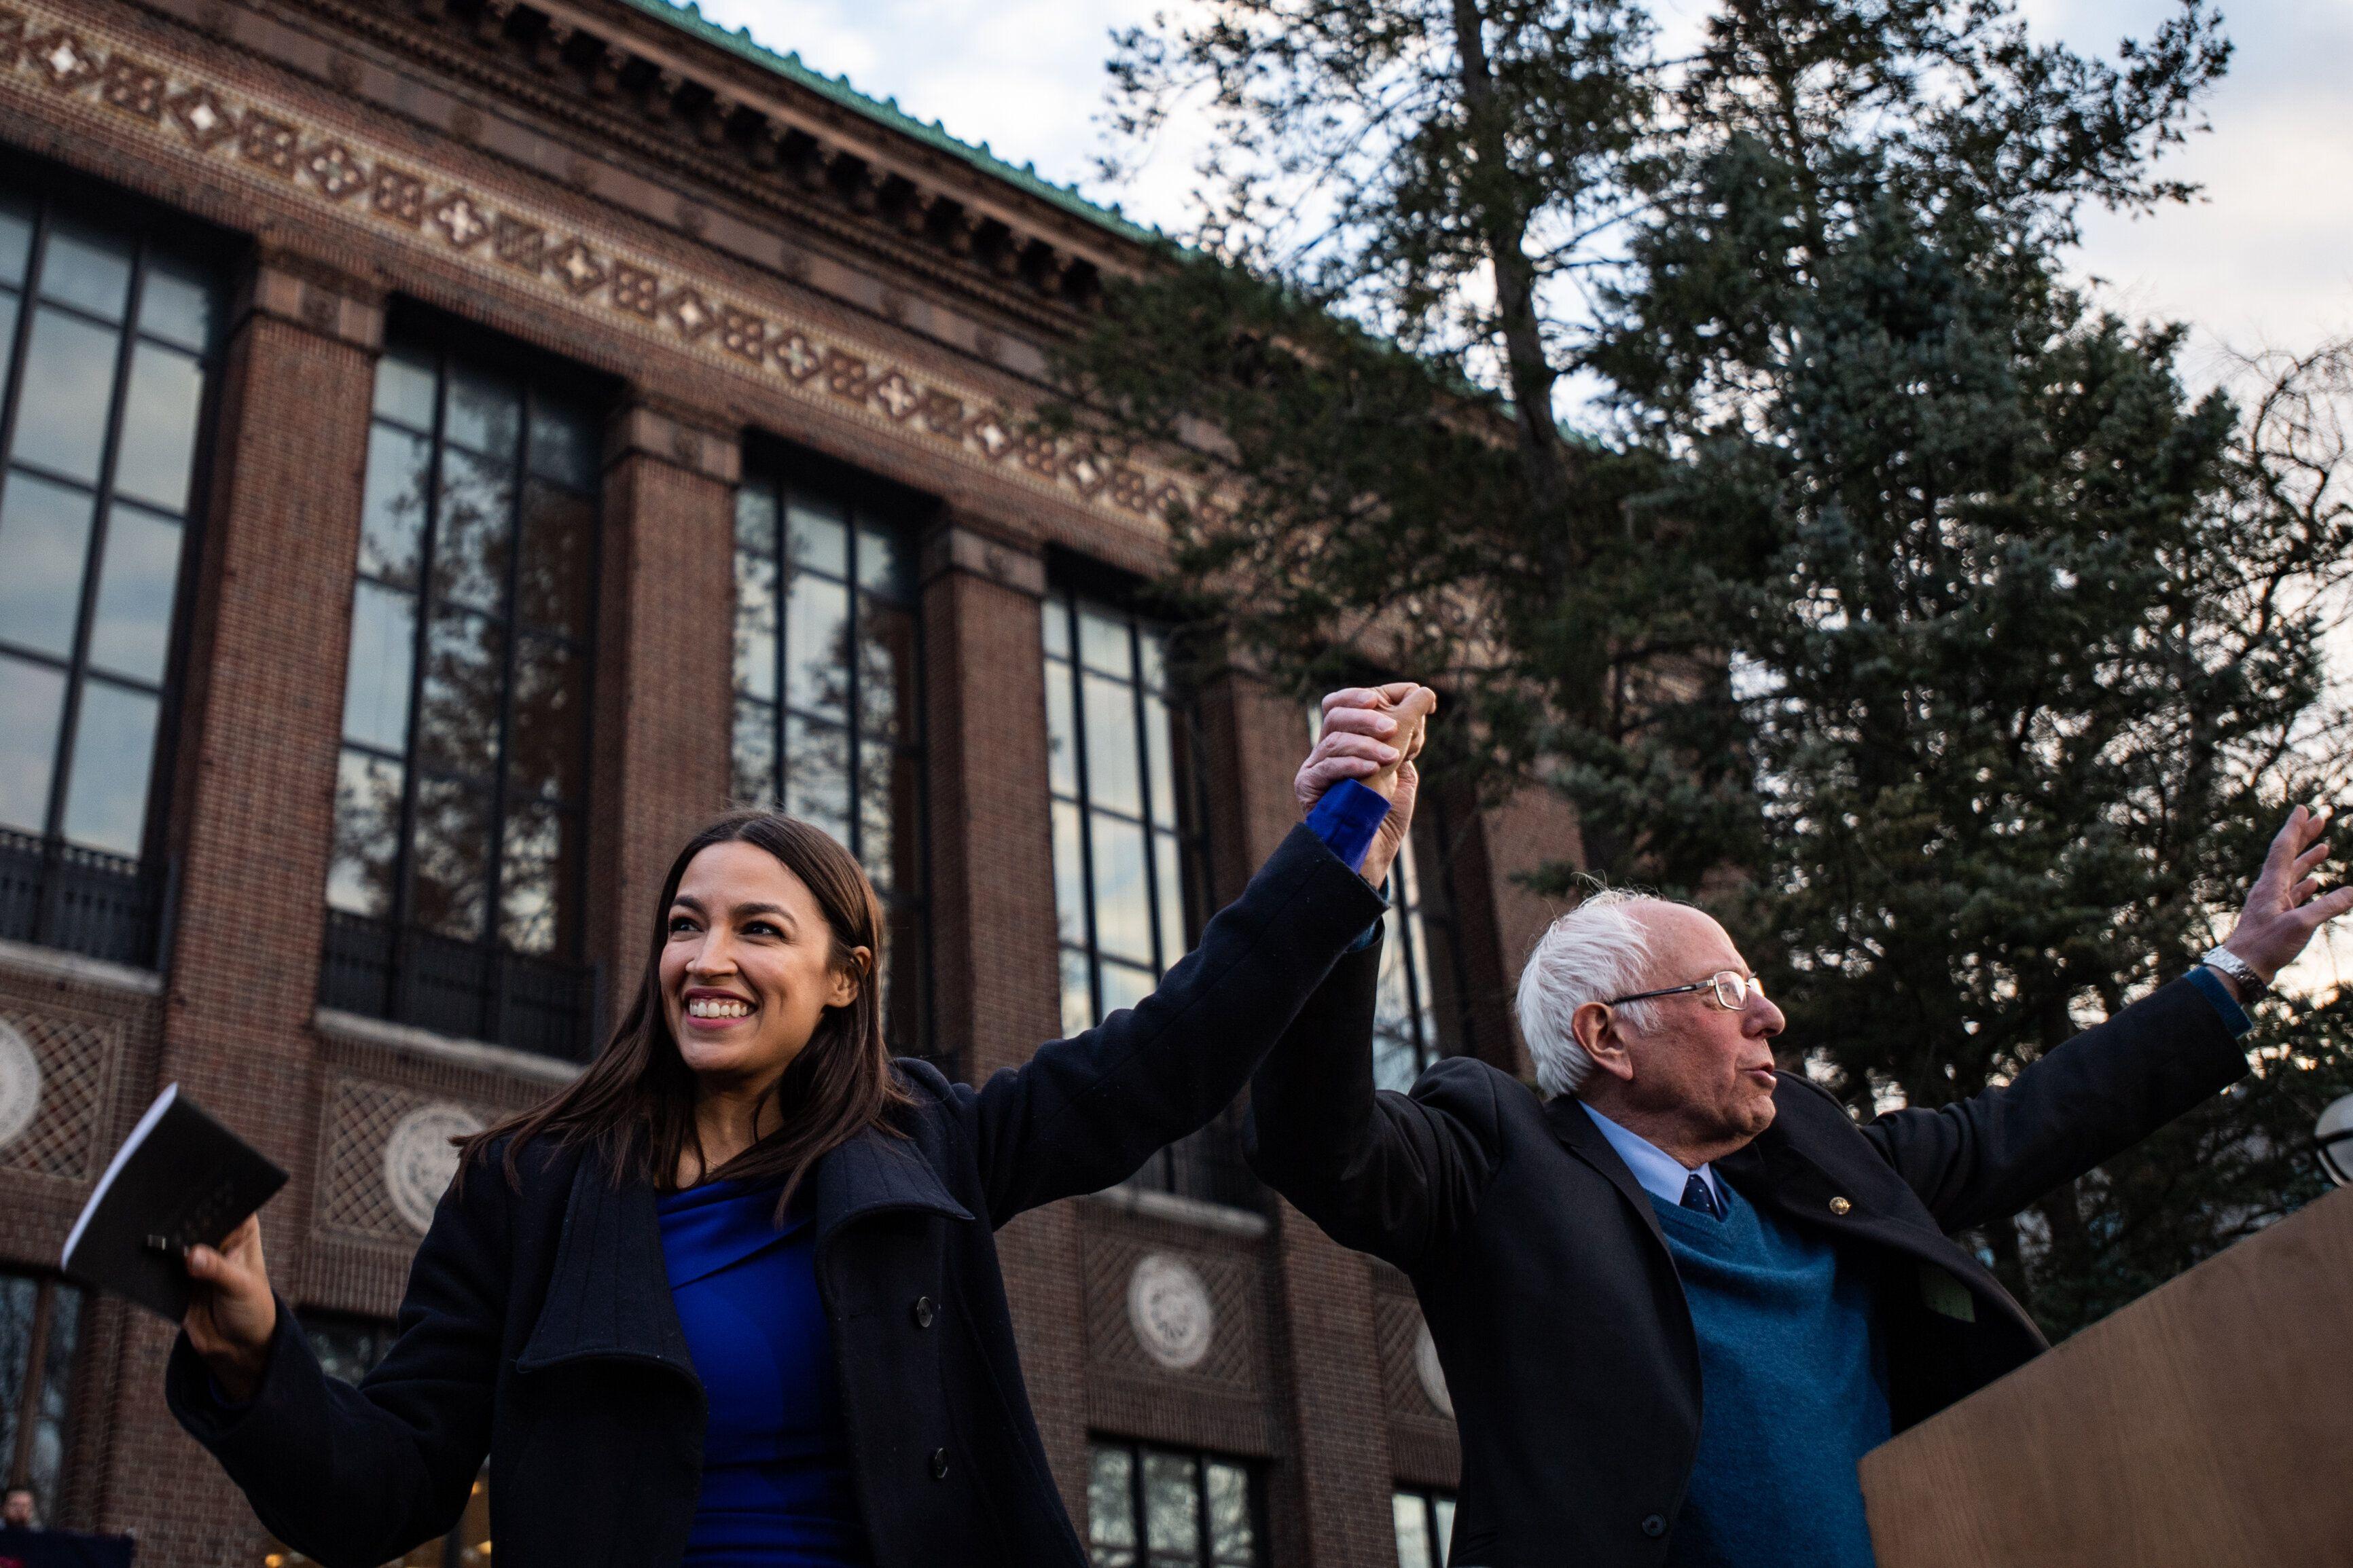 Rep. Alexandria Ocasio-Cortez (D-N.Y.) introduces Sen. Bernie Sanders (I-Vt.) in Ann Arbor, Michigan, on Sunday. It was her f